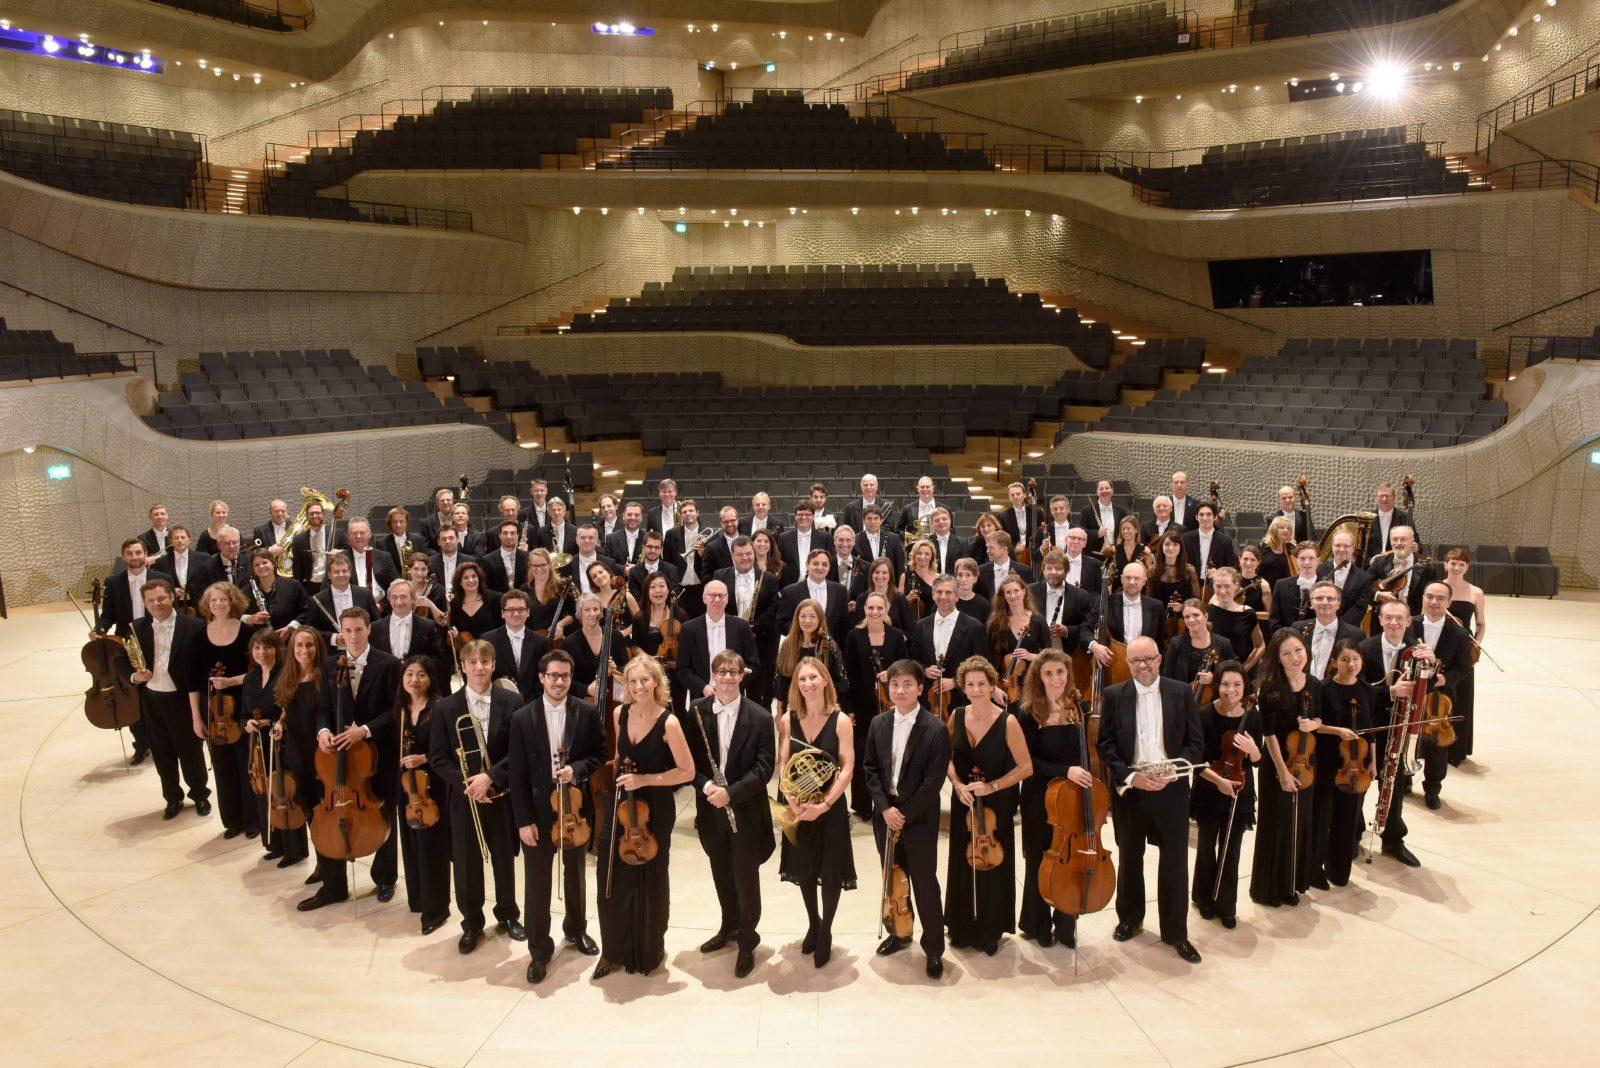 NDR Elbphilharmonie Orchester © Michael Zapf